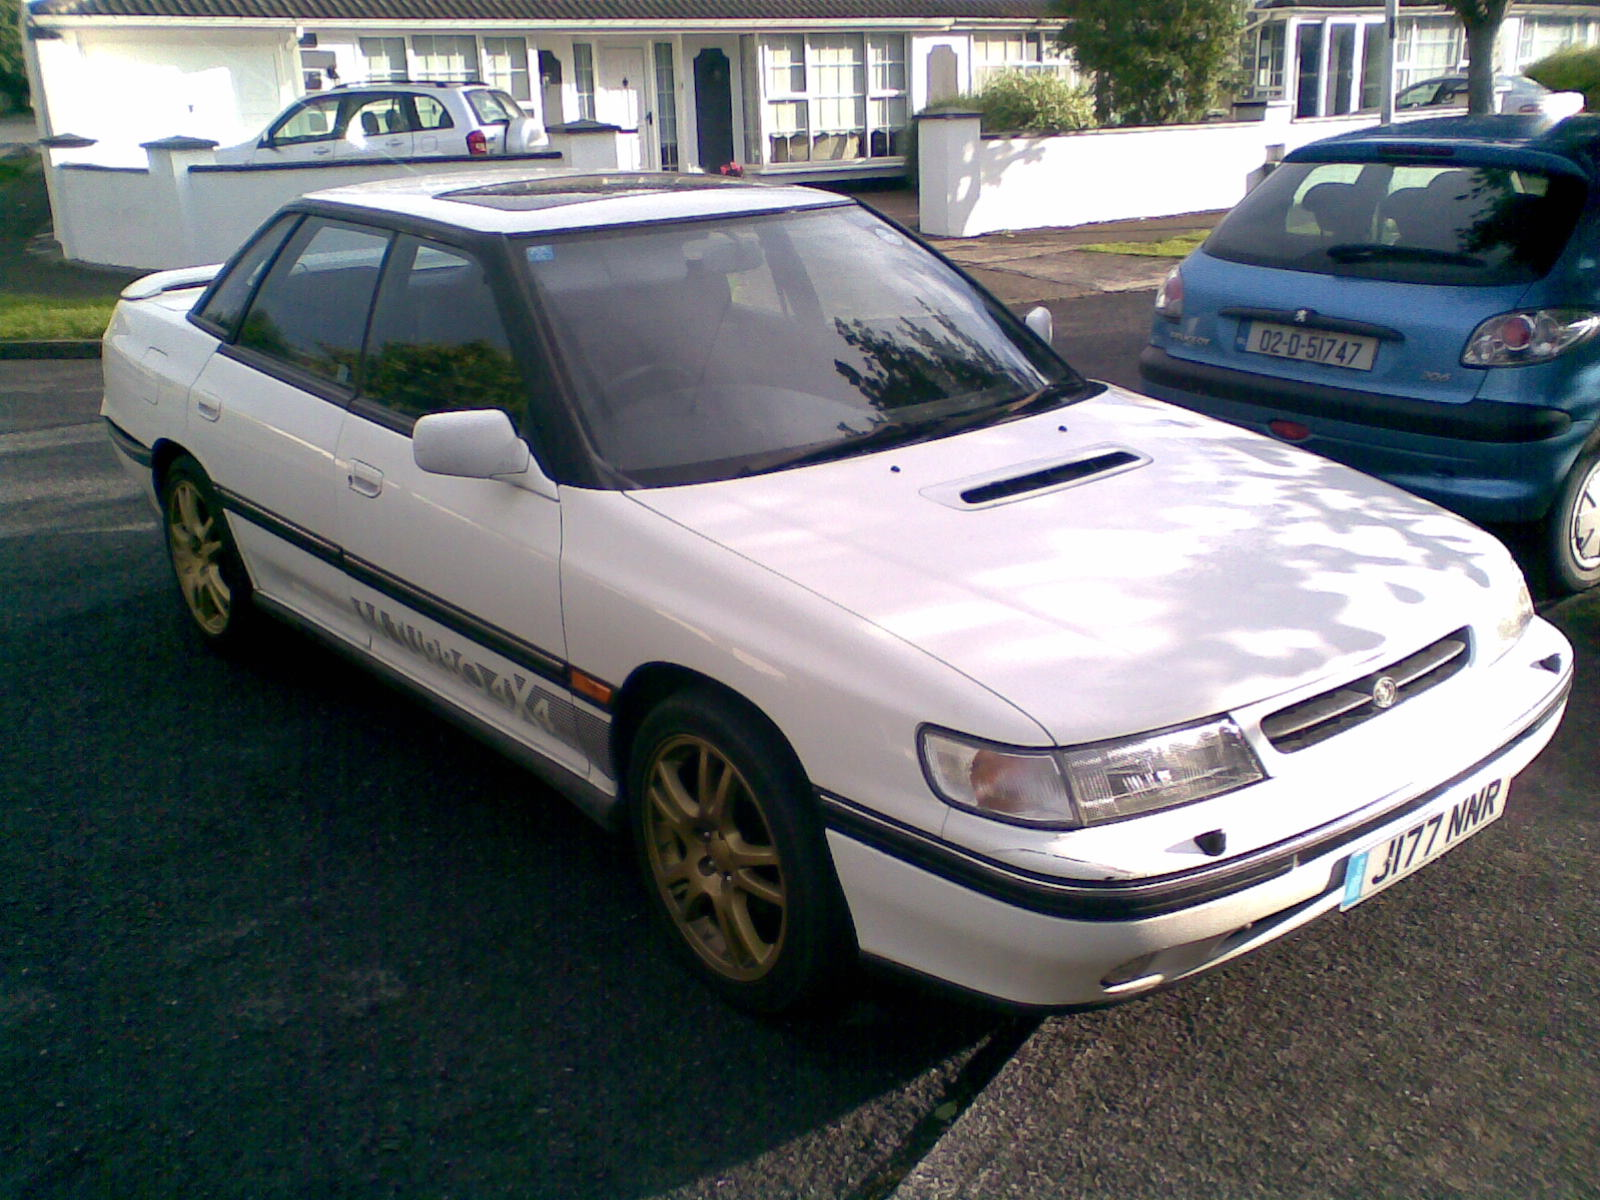 Picture of 1992 subaru legacy 4 dr sport turbo awd sedan exterior